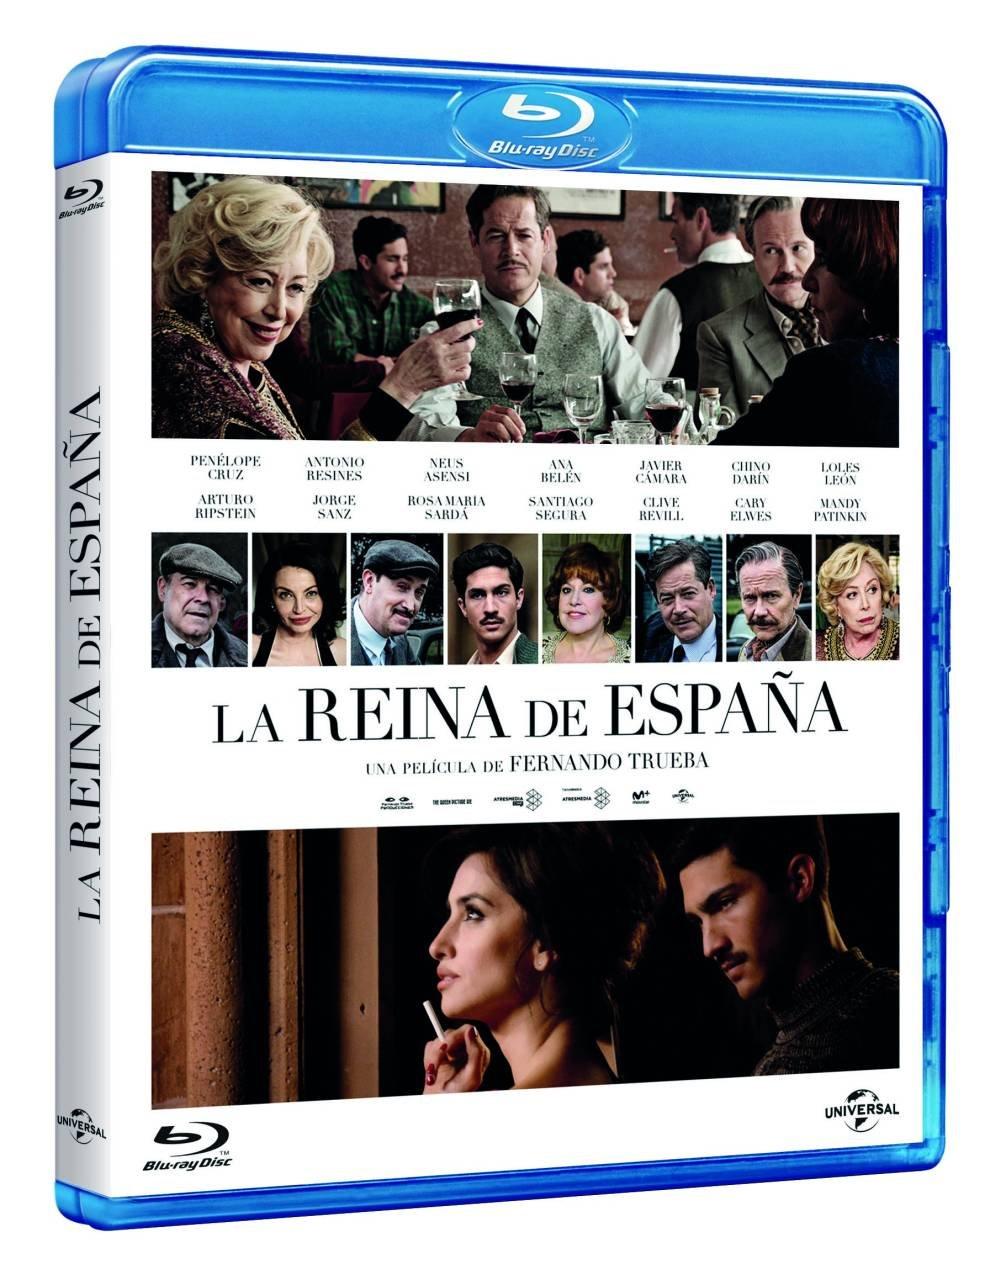 La Reina De España [Blu-ray]: Amazon.es: Penélope Cruz, Cary Elwes ...